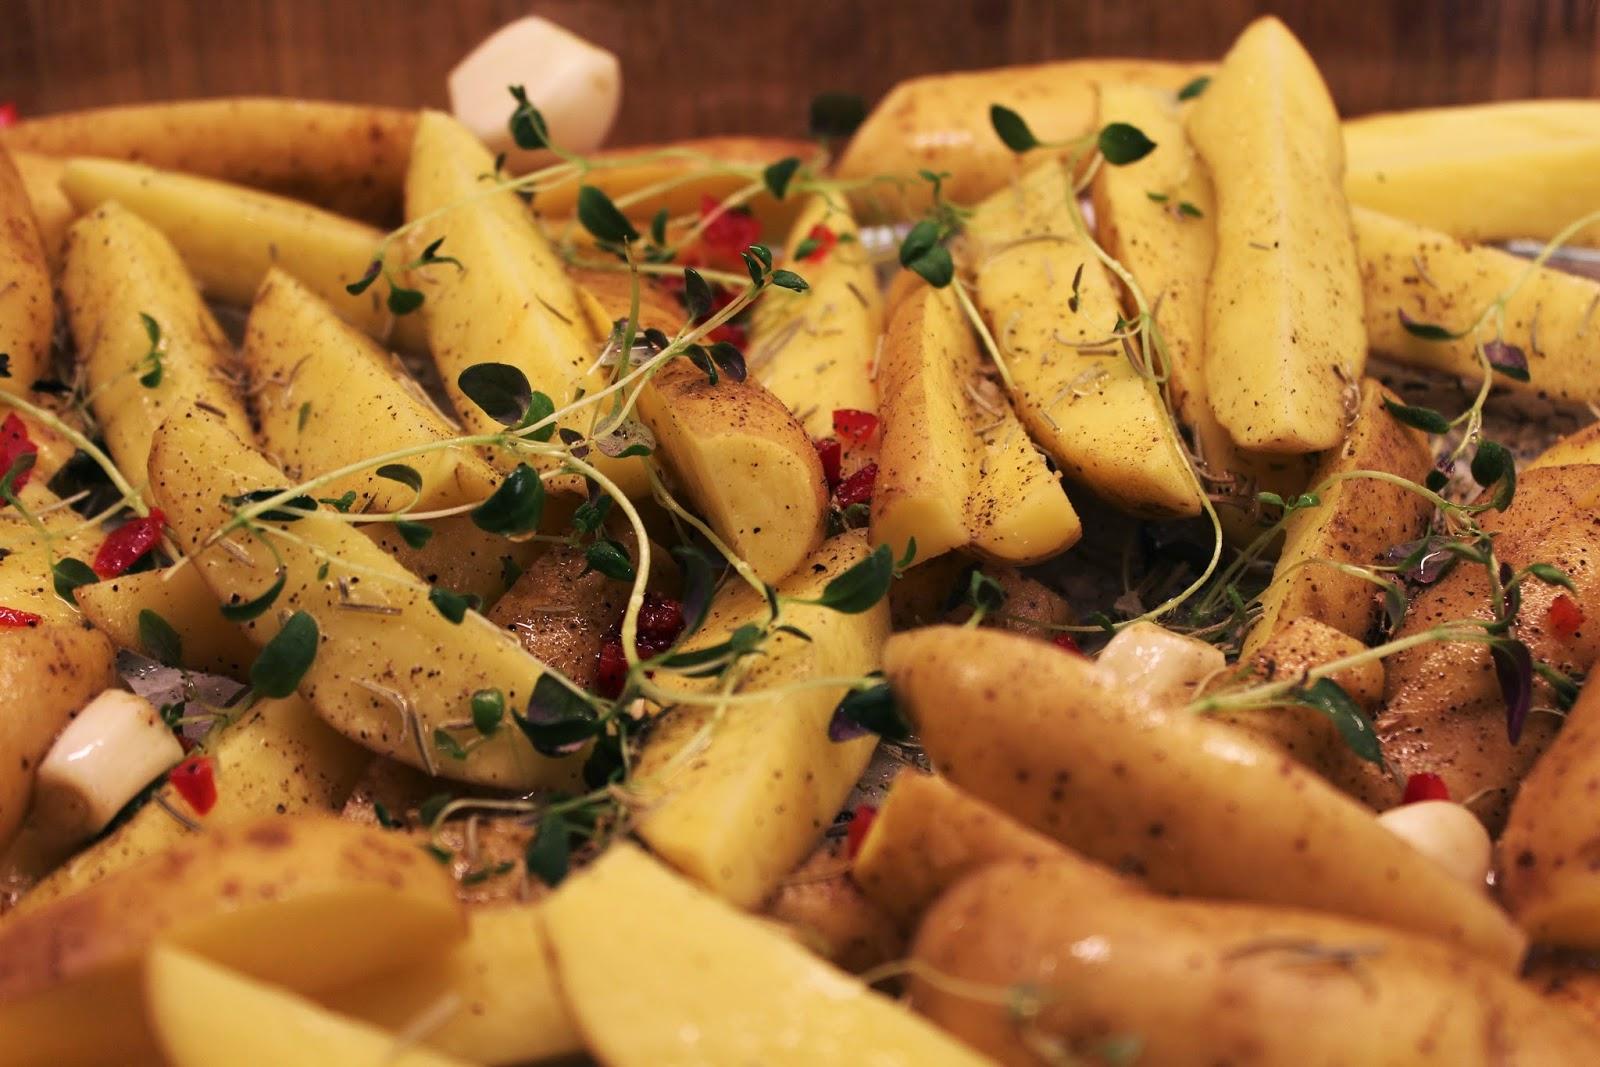 ovnsbakte poteter hele